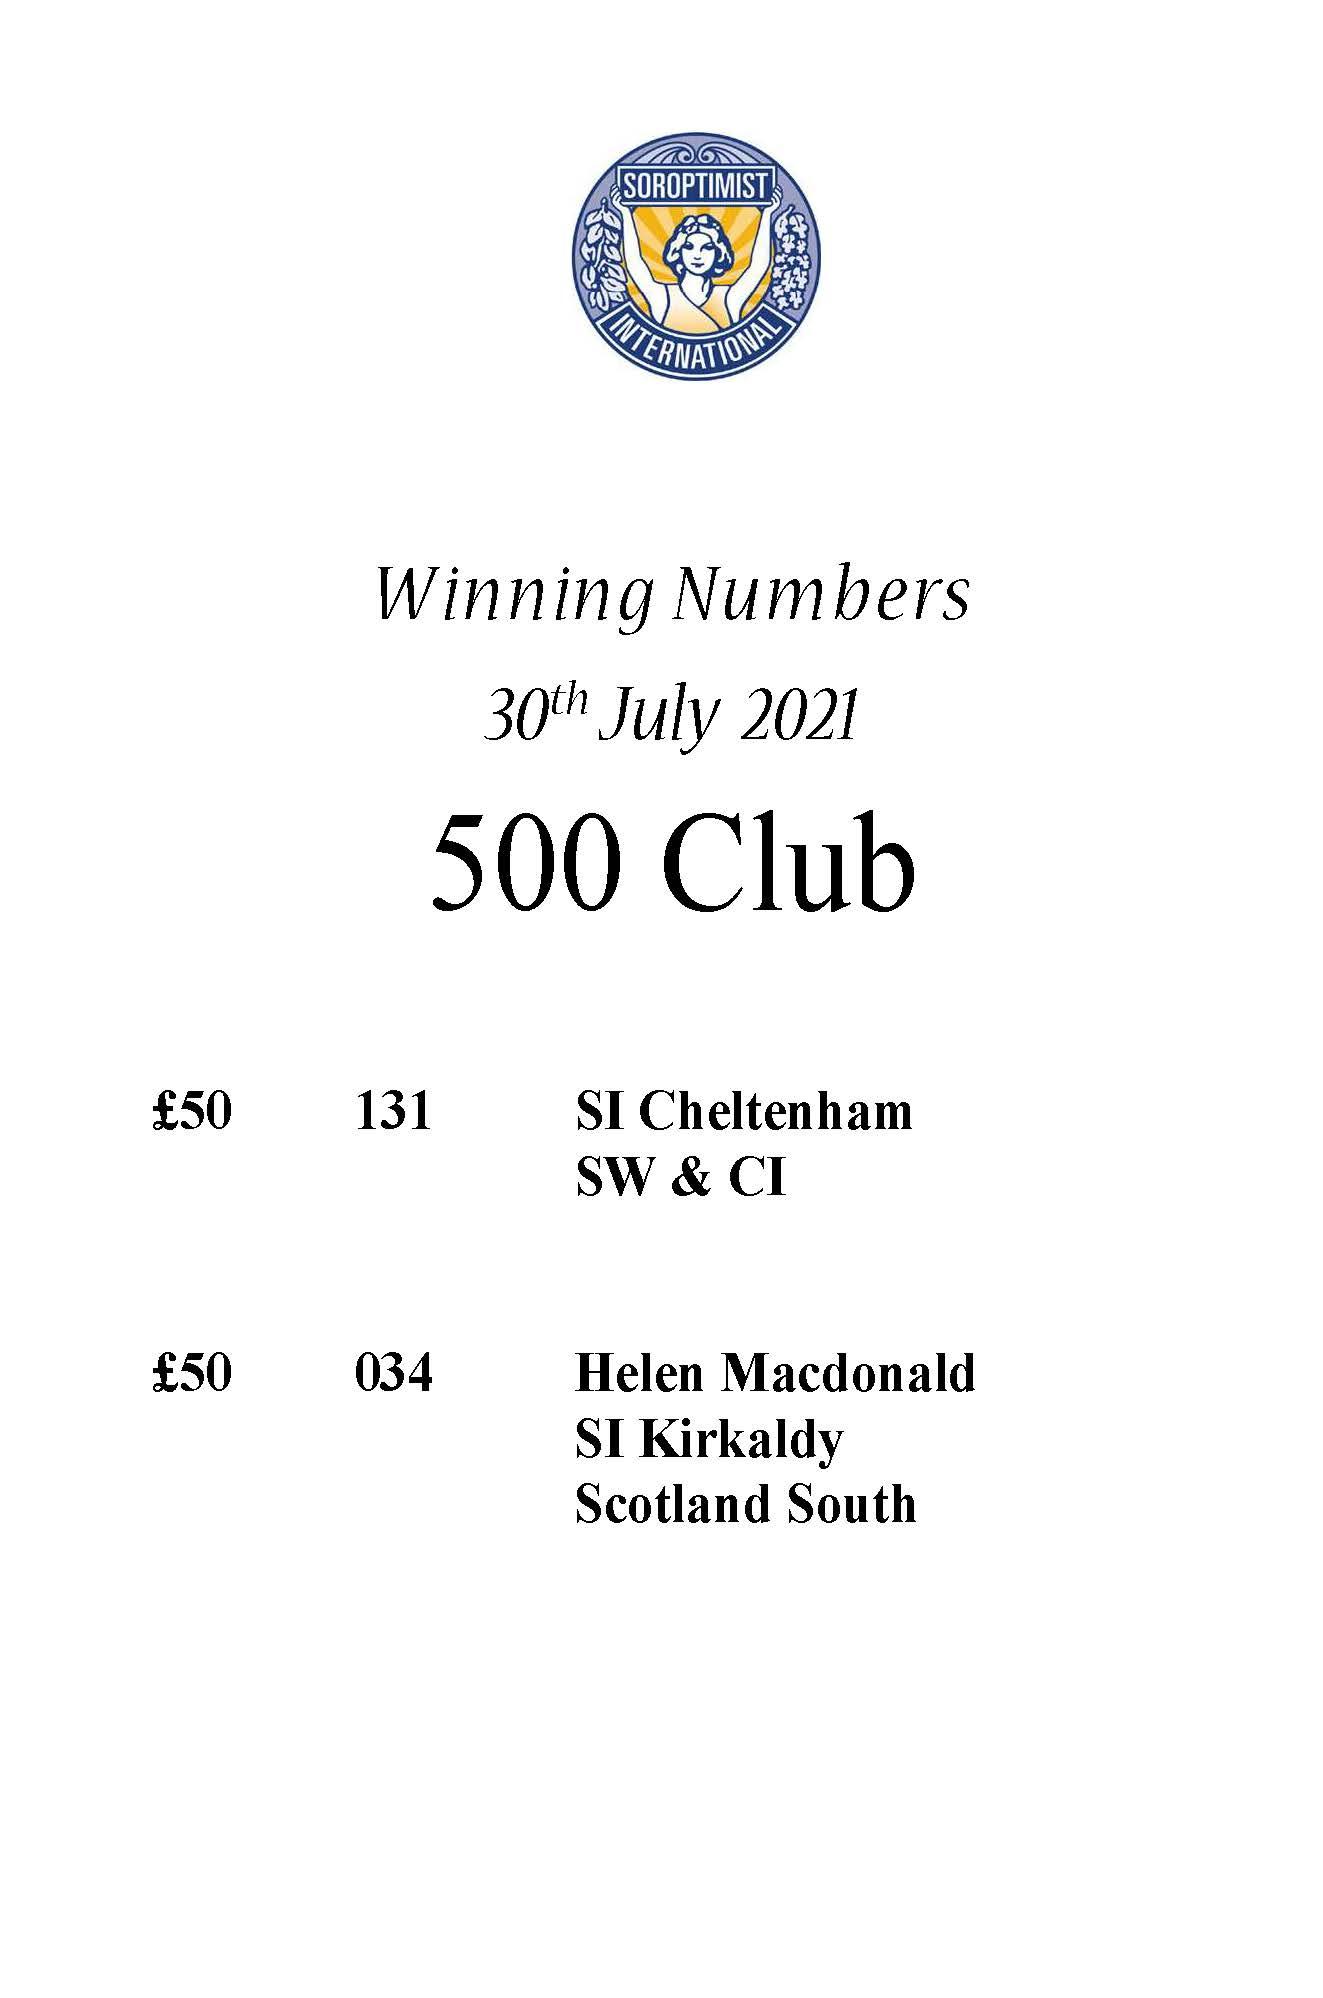 500 Club Winners - July 2021